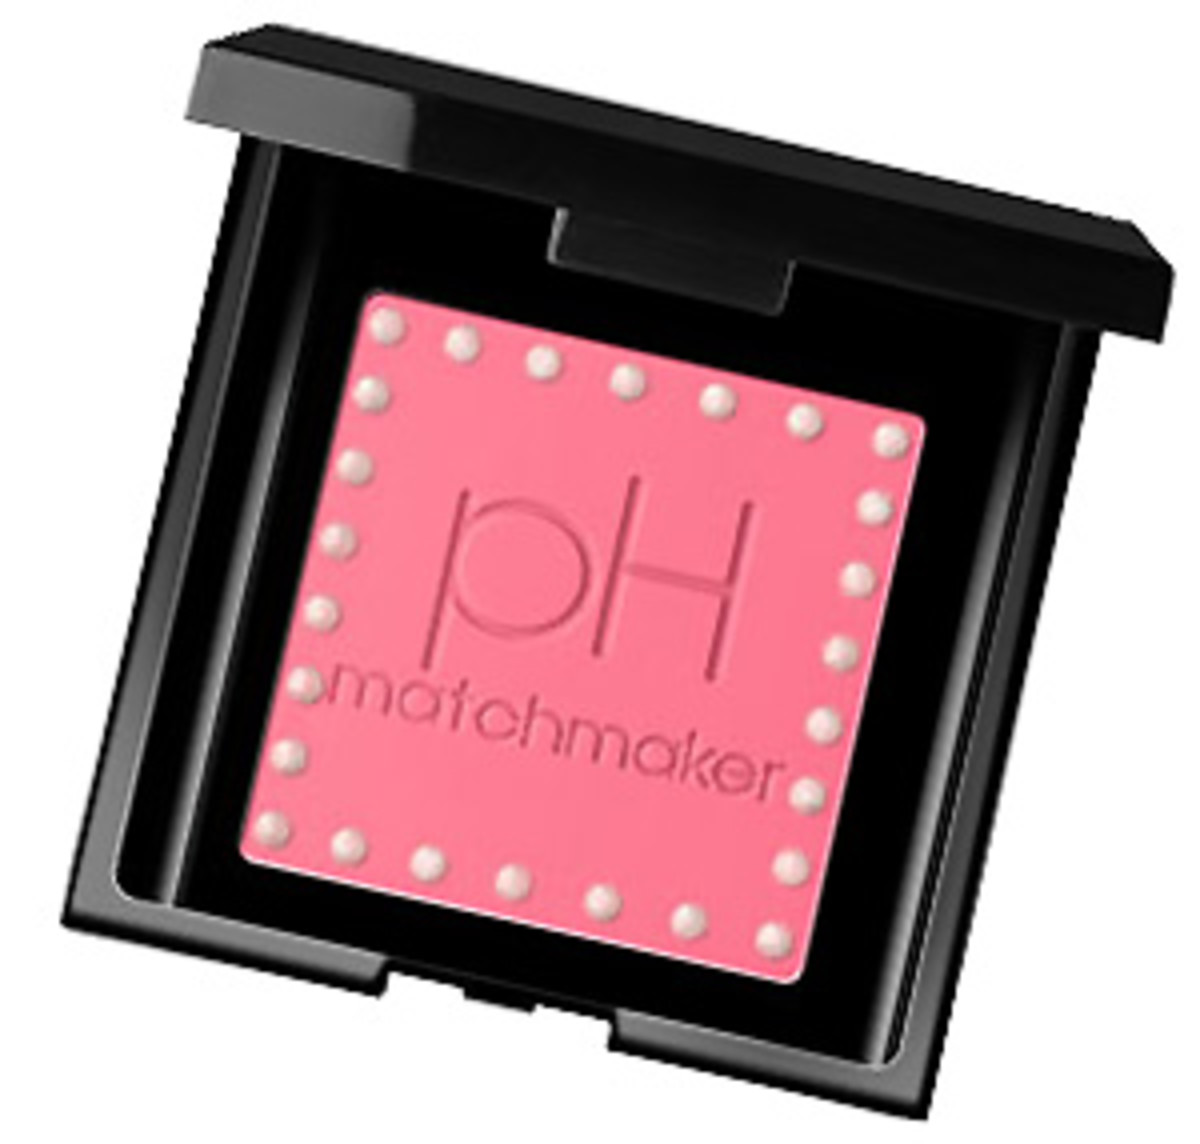 physicians-formula-ph-matchmaker-ph-powered-blush